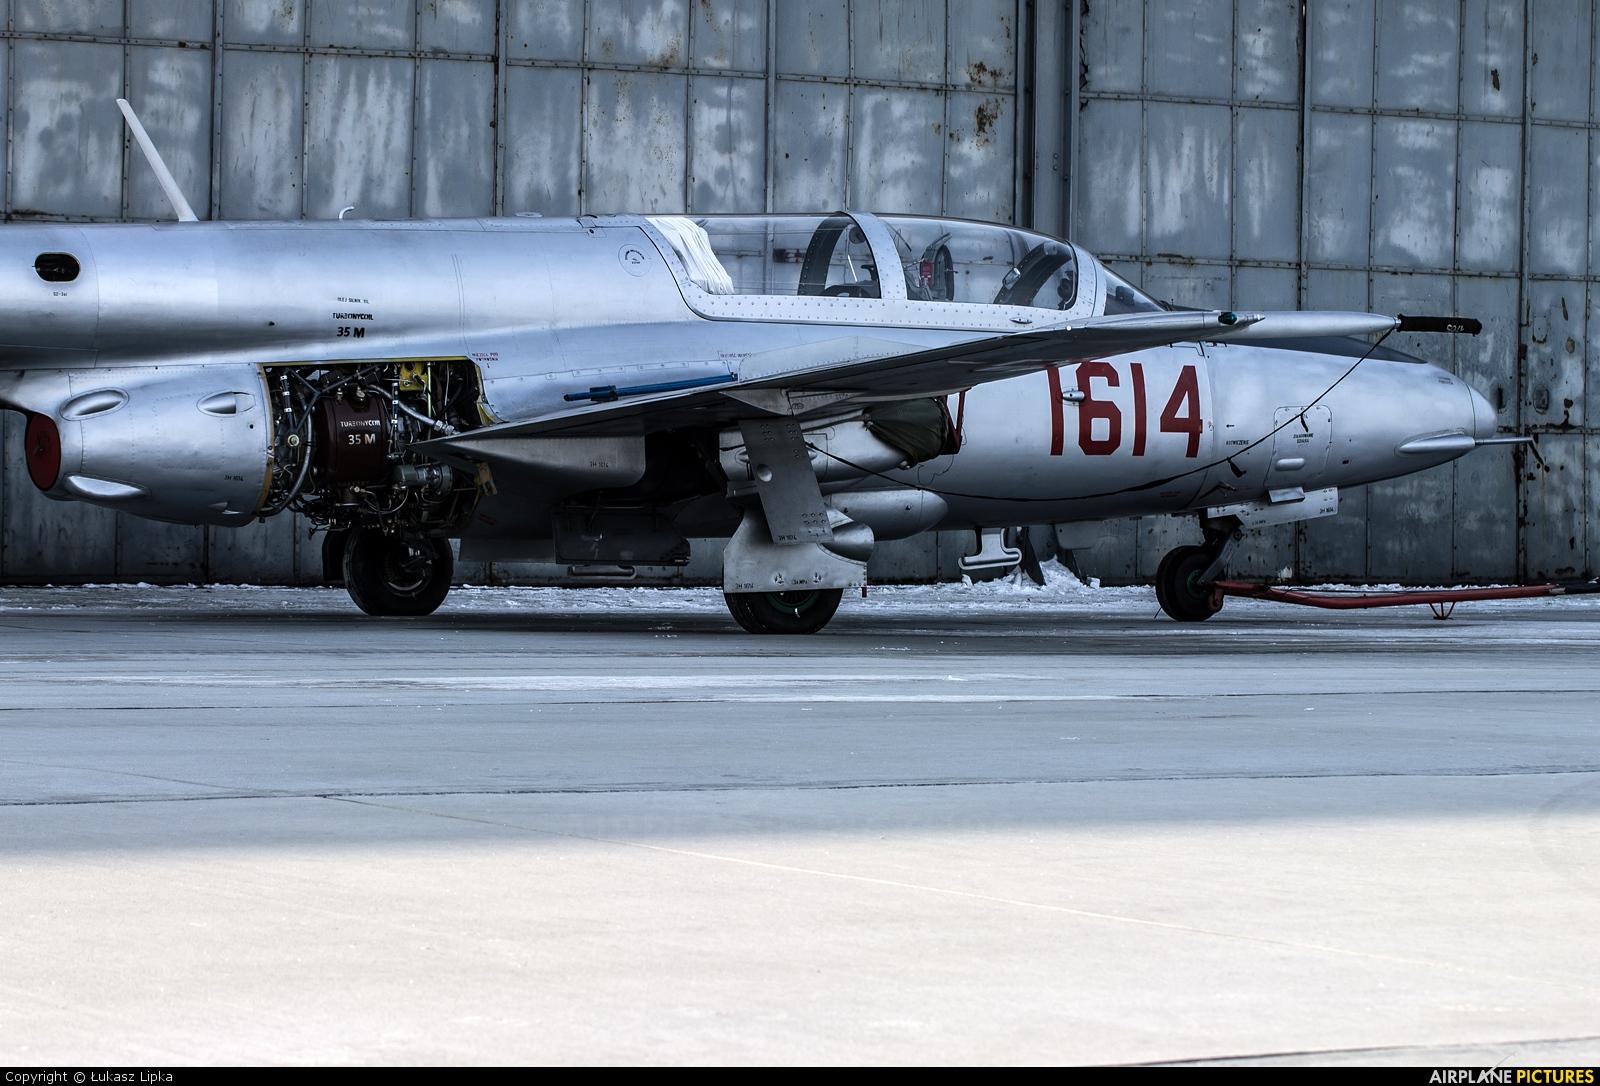 Poland - Air Force 1614 aircraft at Dęblin